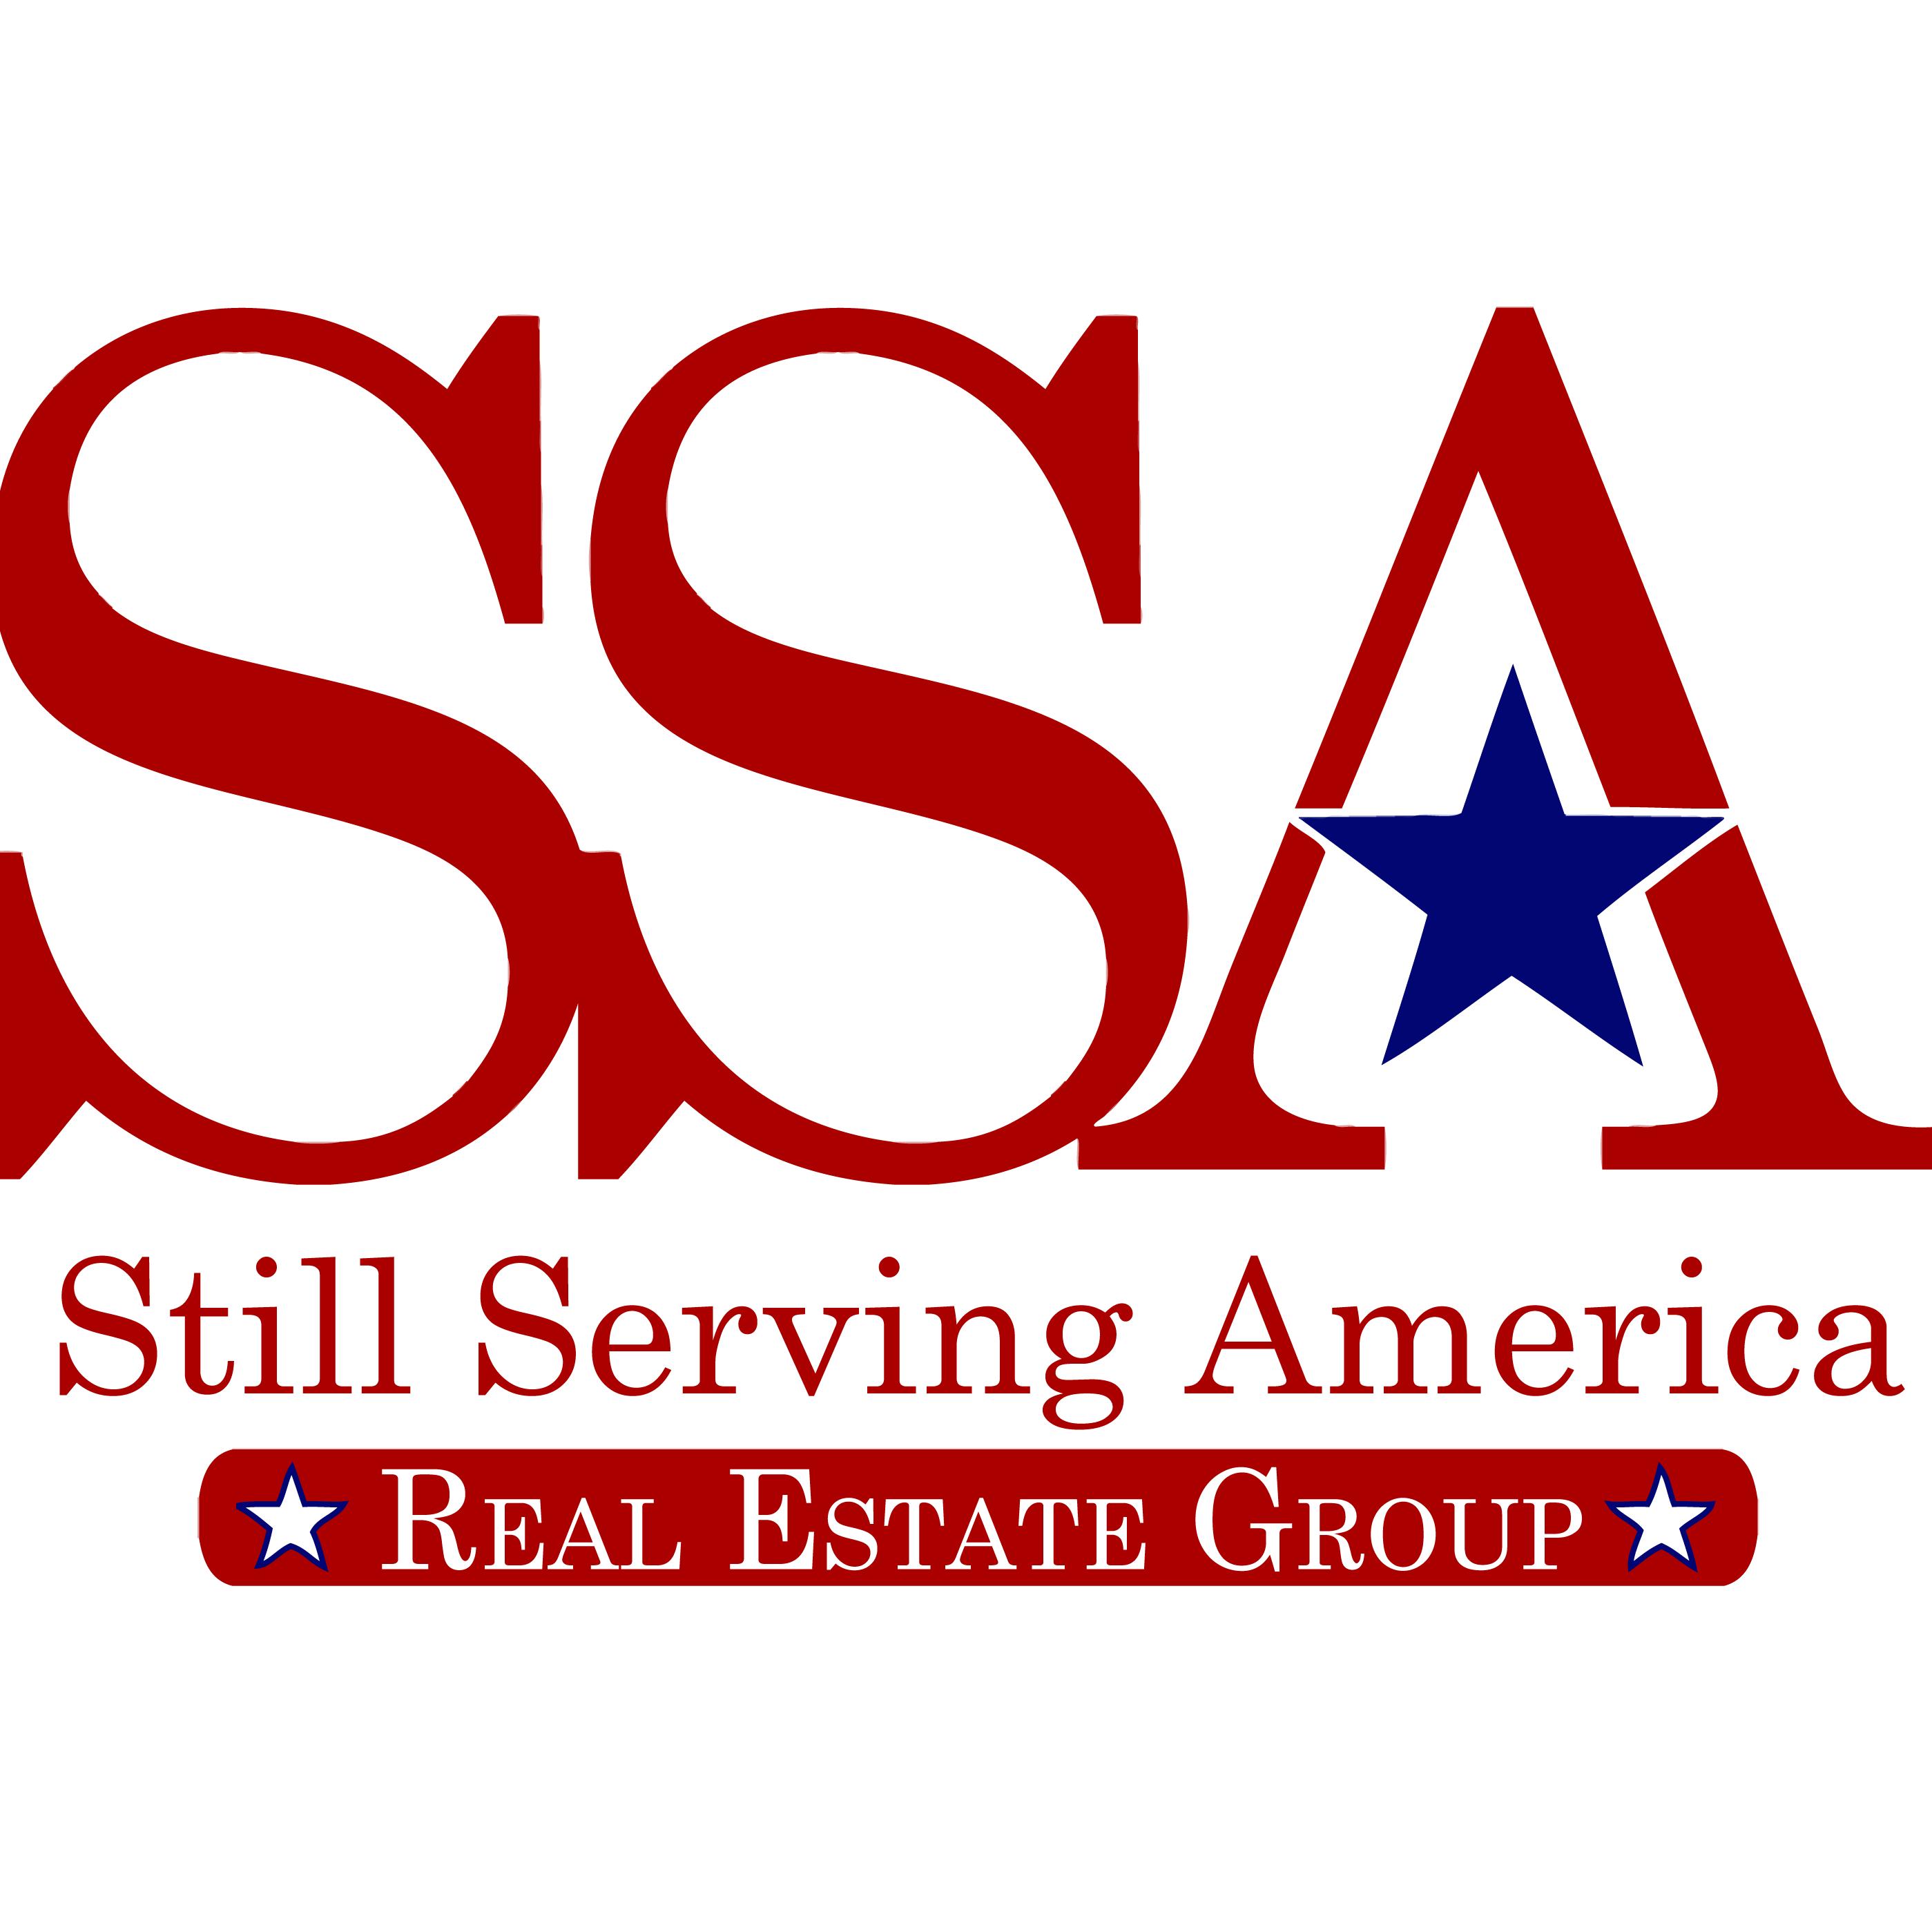 Still Serving America Real Estate Group